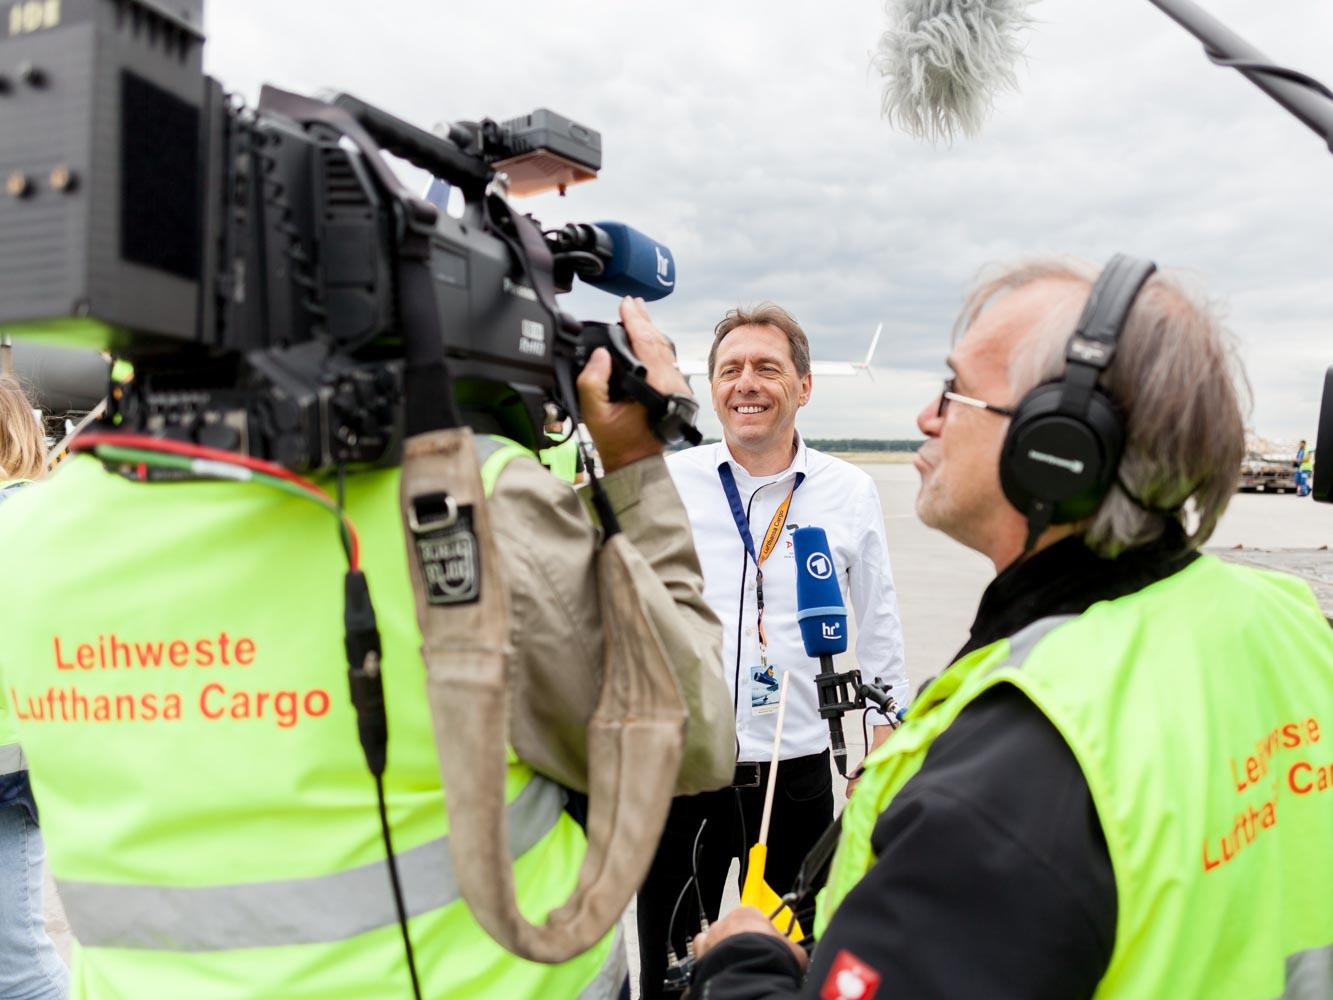 reportage_daniel_kummer-lufthansa_cargo_dahw_2018-08